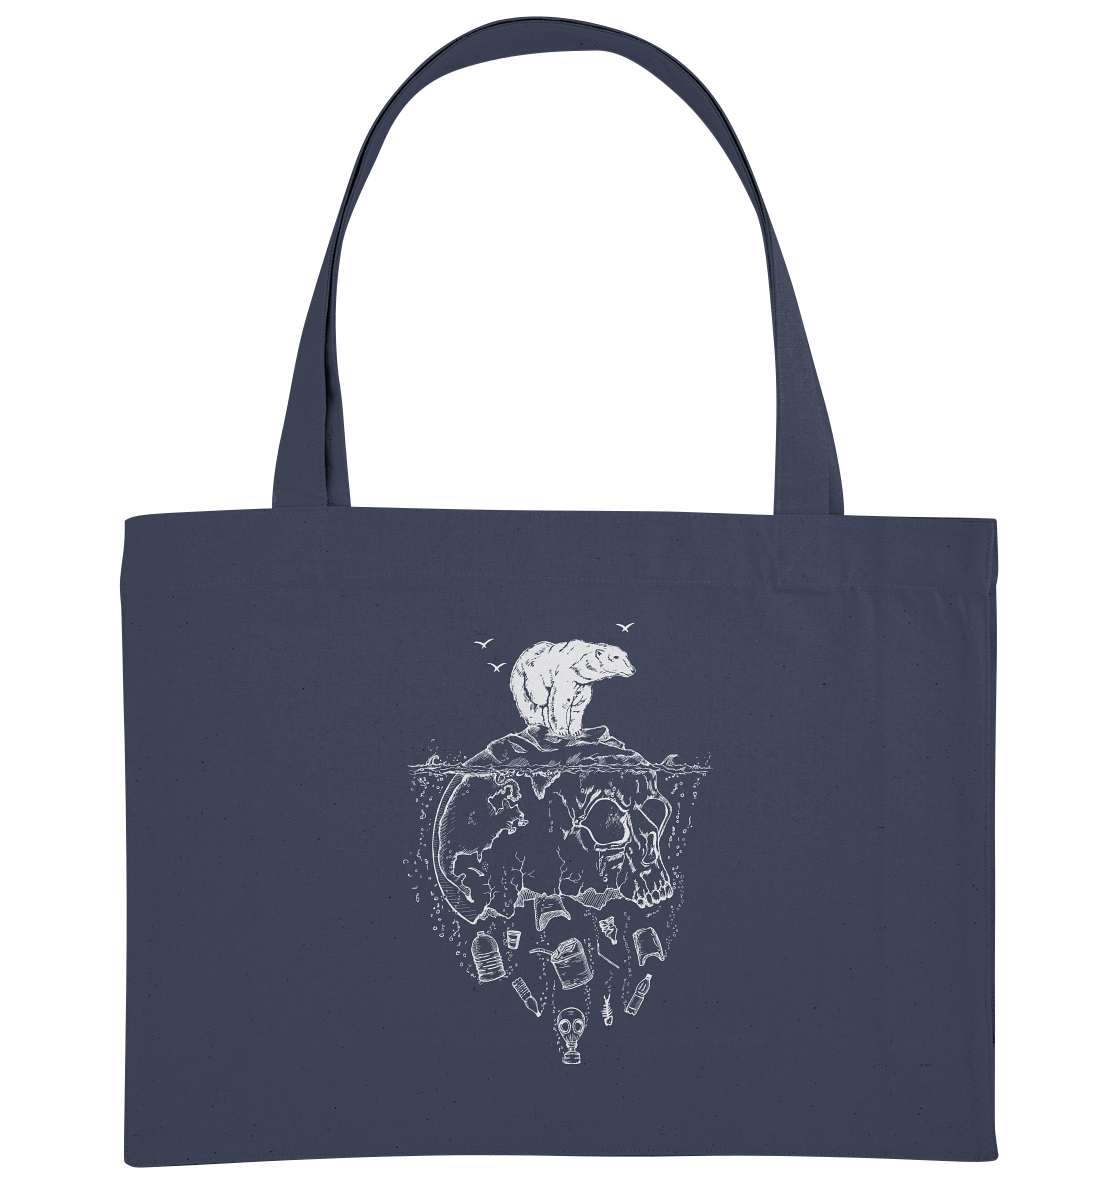 front-organic-shopping-bag-42475c-1116x.png